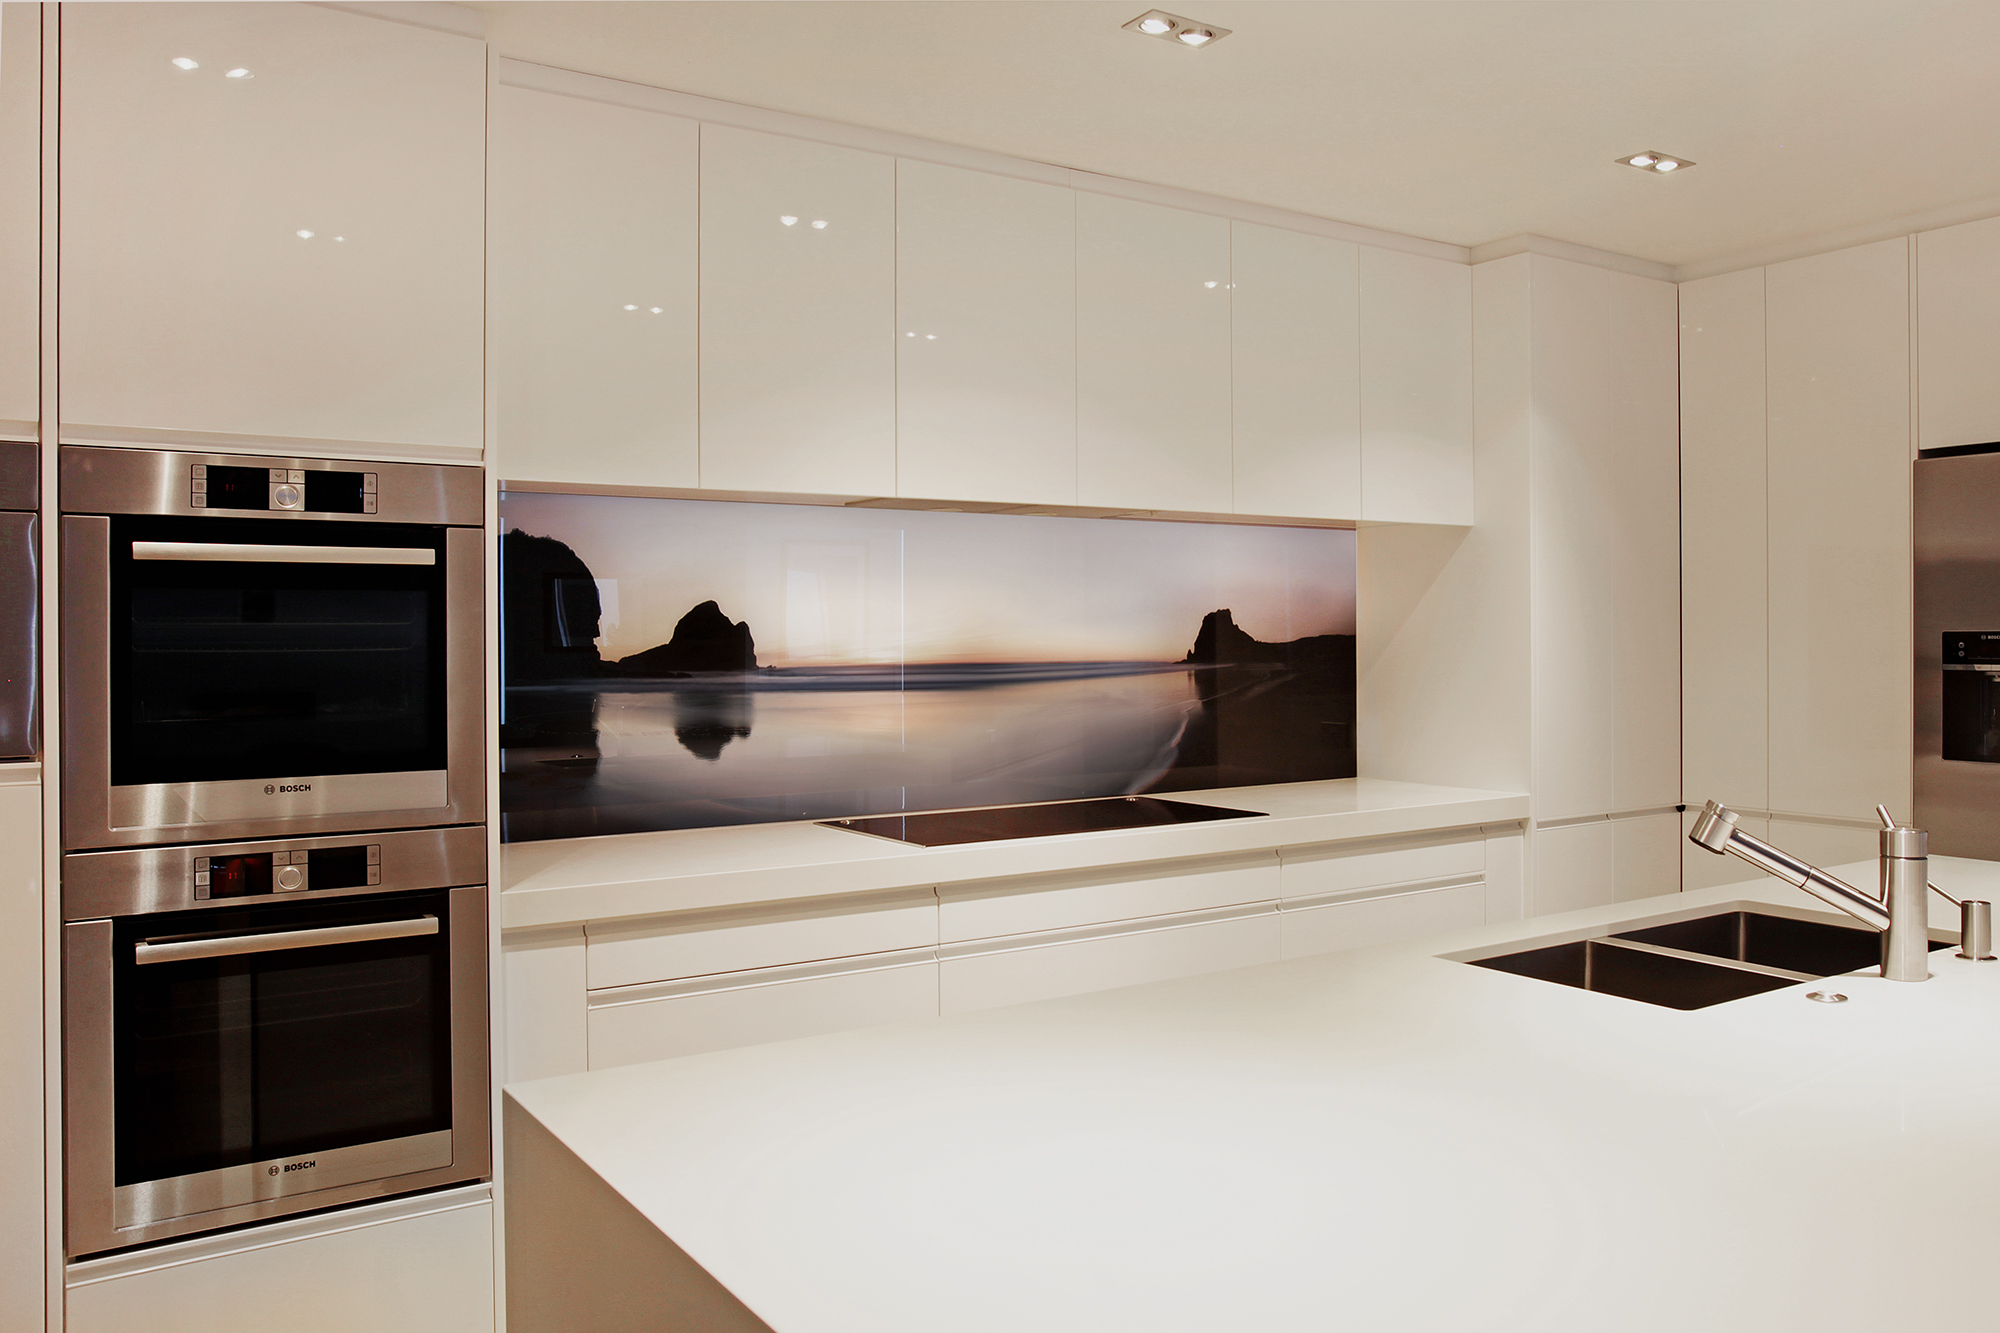 Piha Sunset printed image on glass splashabck